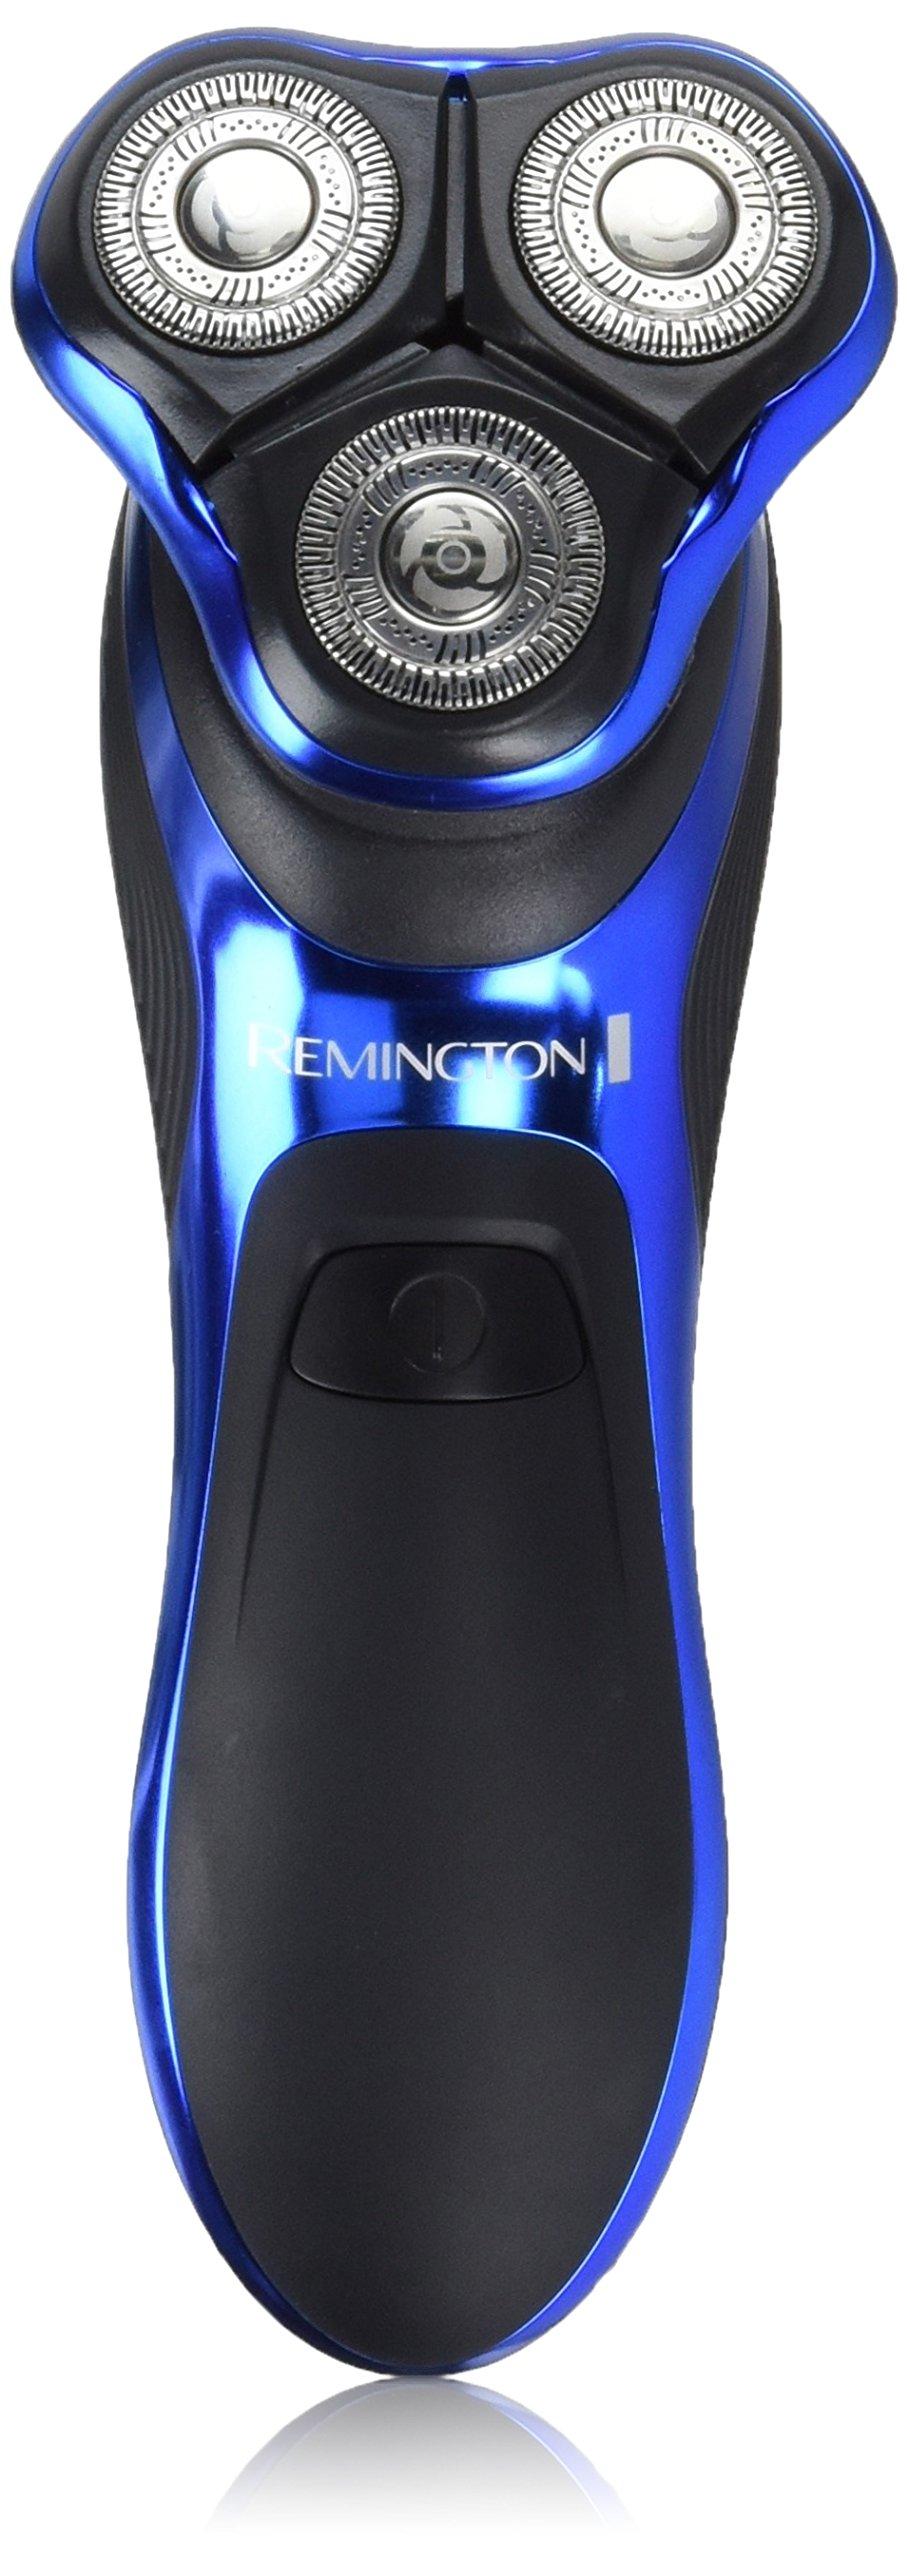 Remington XR1470 HyperFlex Wet & Dry Shaver, Men's Electric Razor, Electric Shaver by Remington